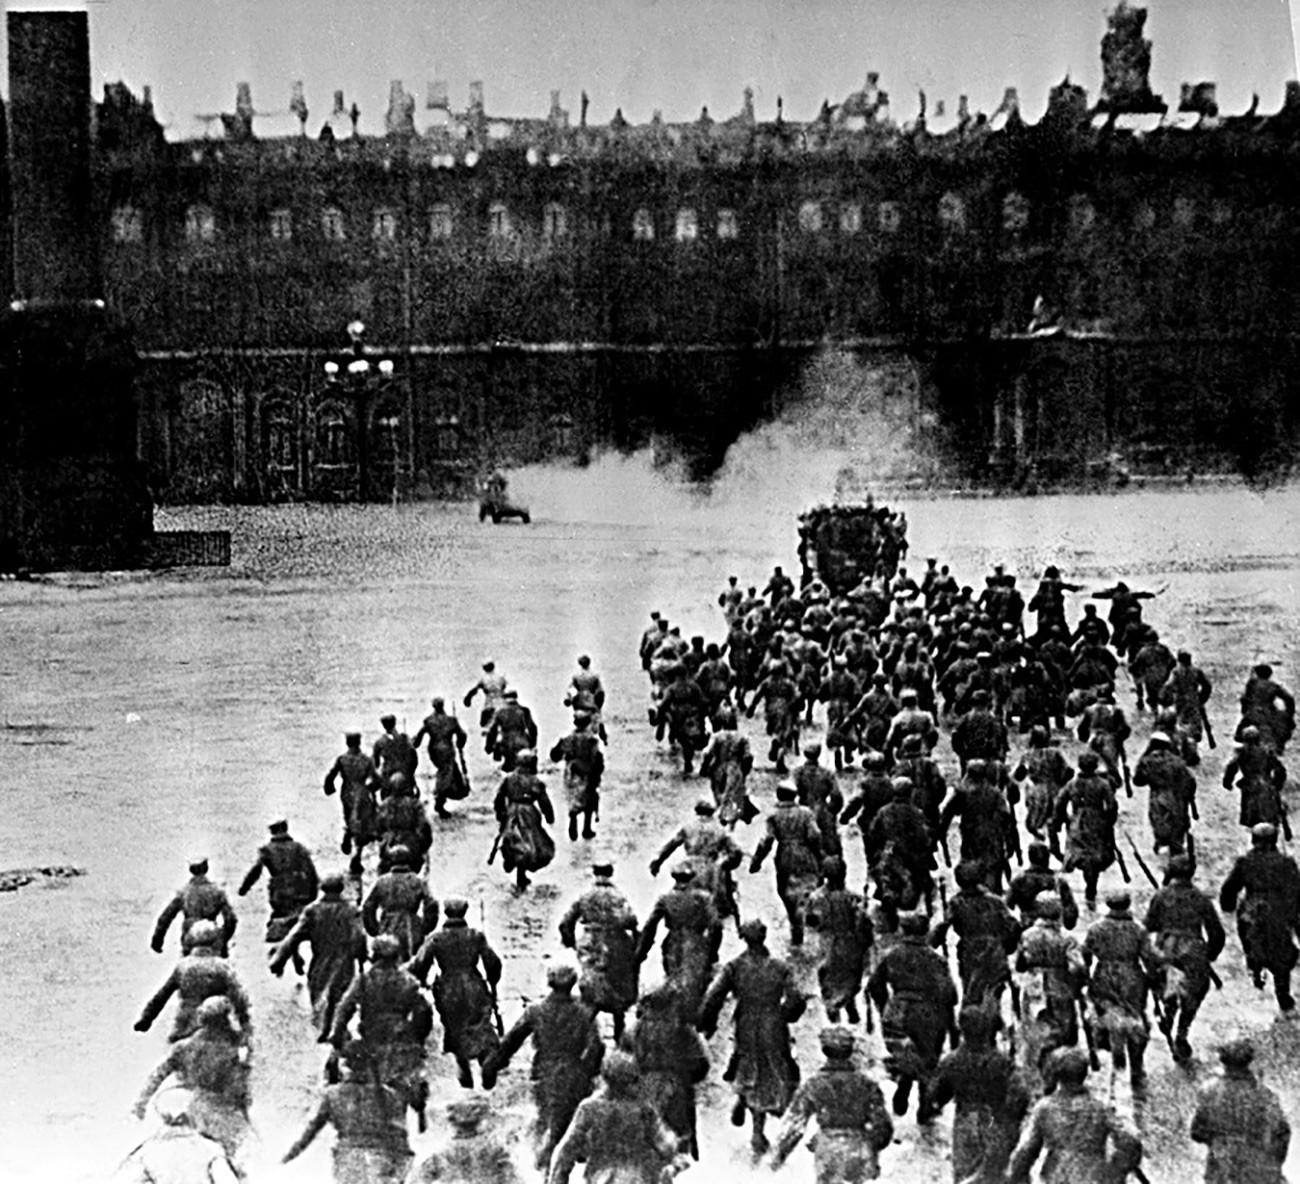 L'assalto al Palazzo d'Inverno a Pietrograd (oggi San Pietroburgo), 1917